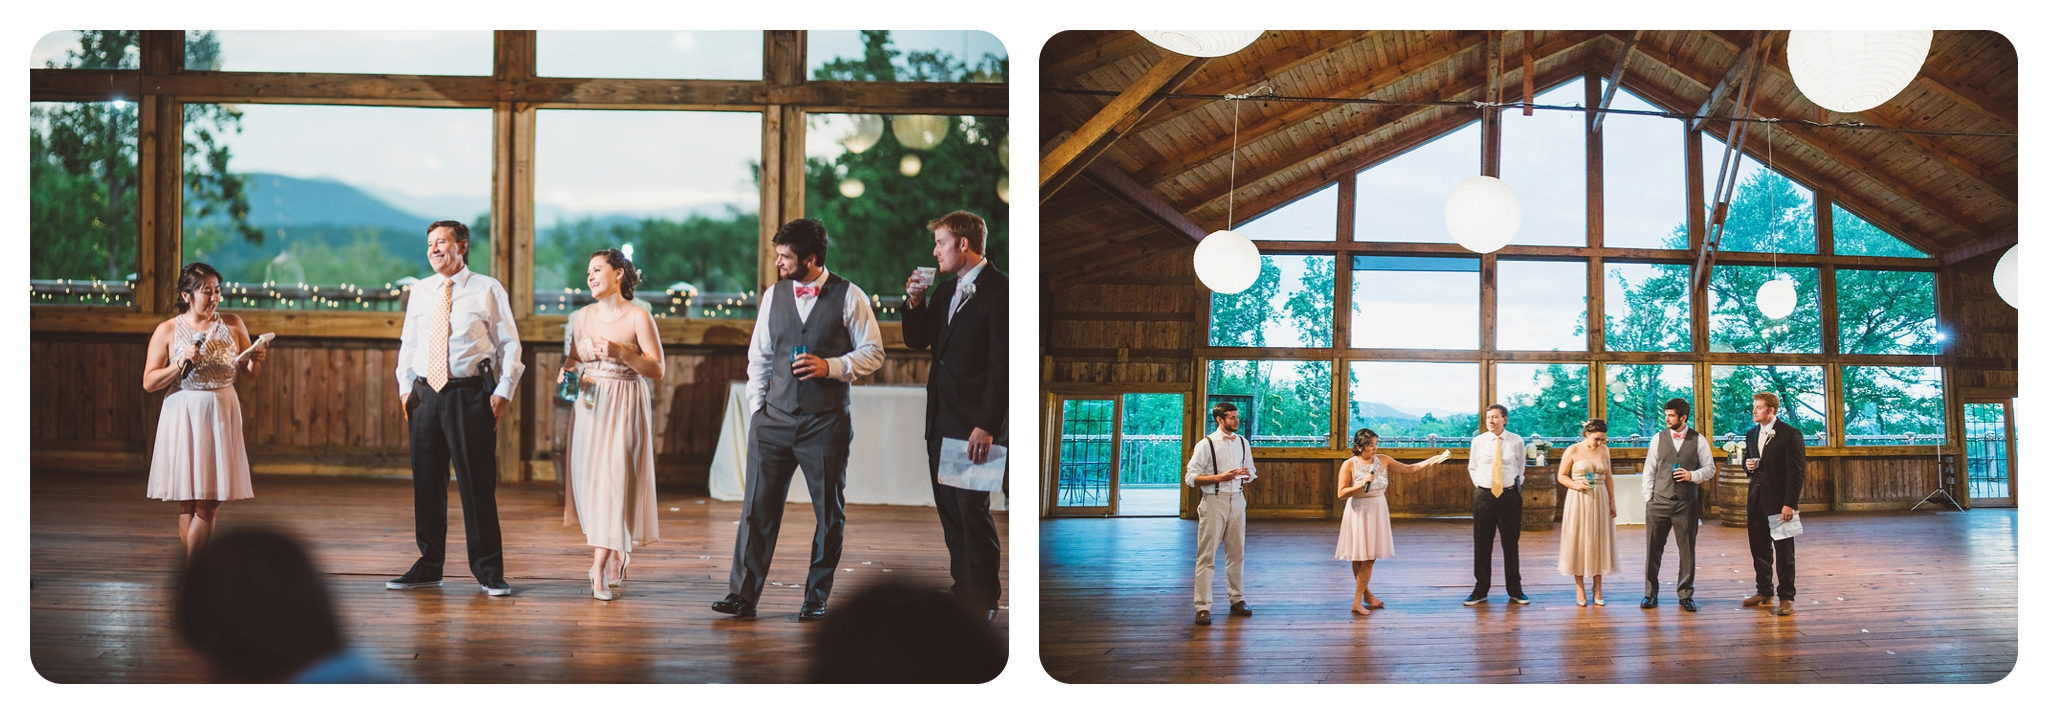 Braeloch-Weddings-Wedding-Photographer-Pat-Cori-Photography-036.jpg